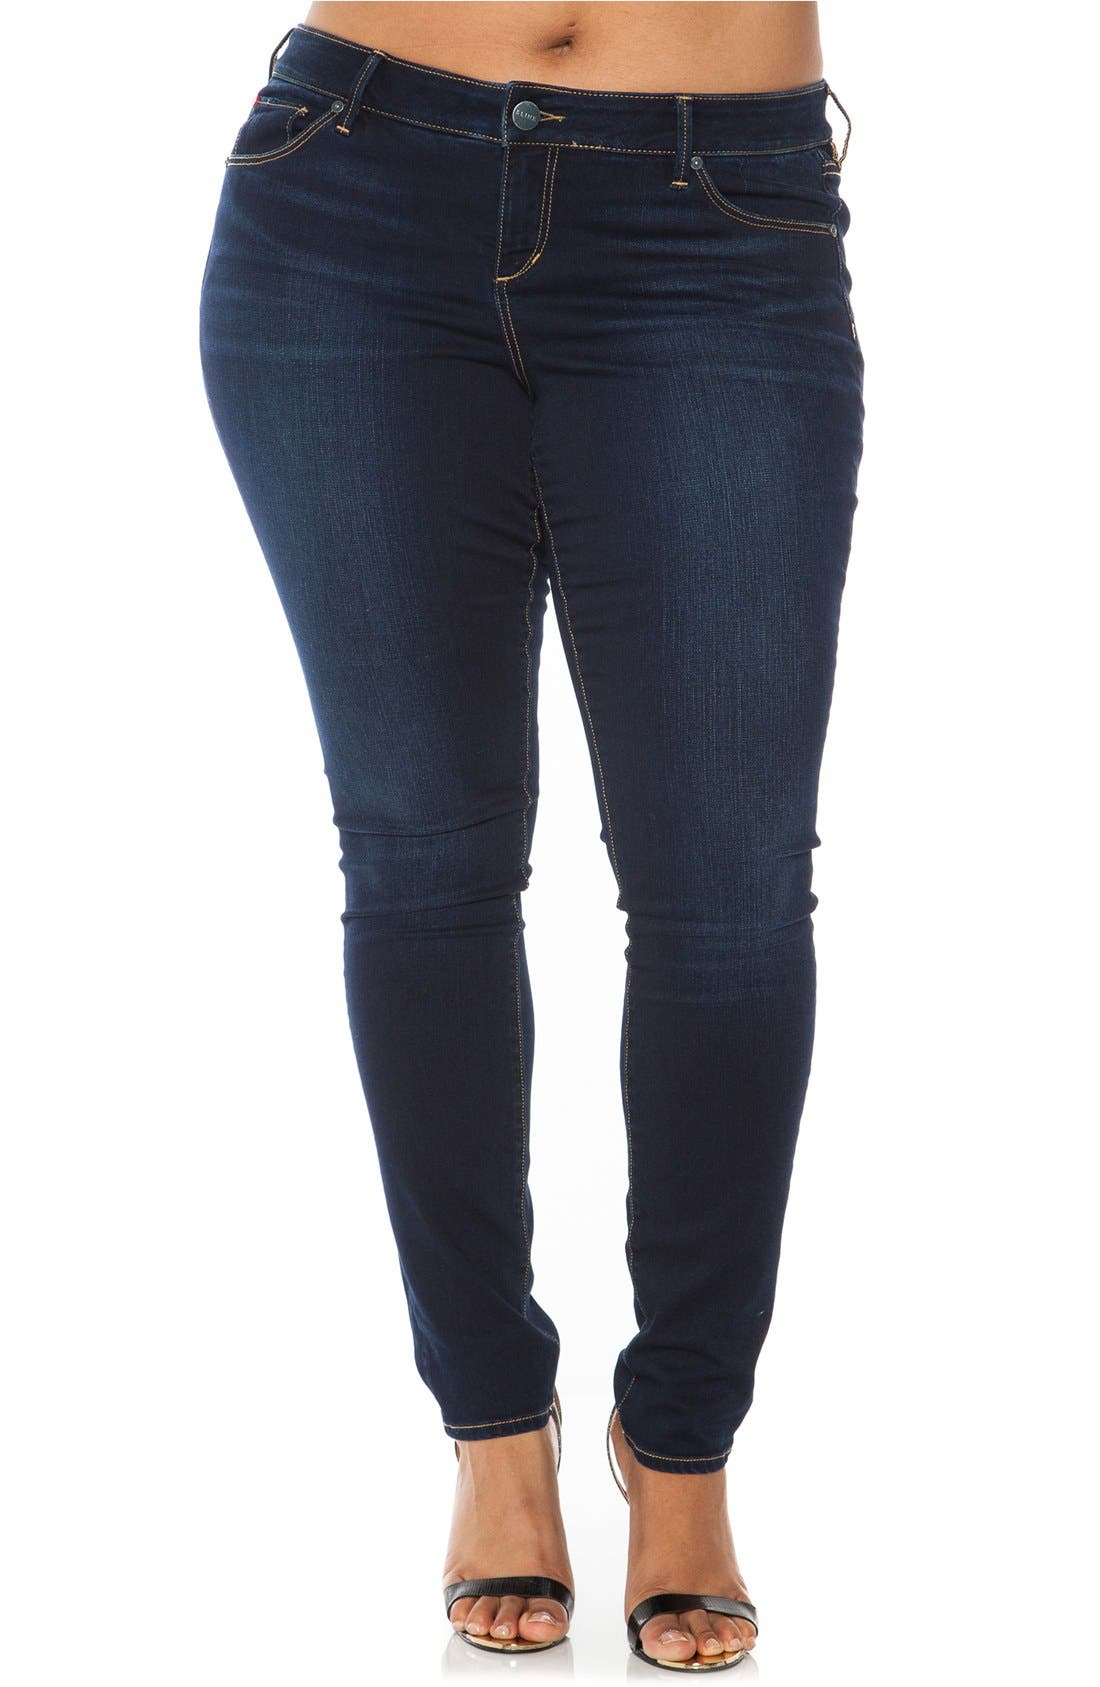 SLINK Jeans 'The Skinny' Stretch Denim Jeans (Amber) (Plus Size)